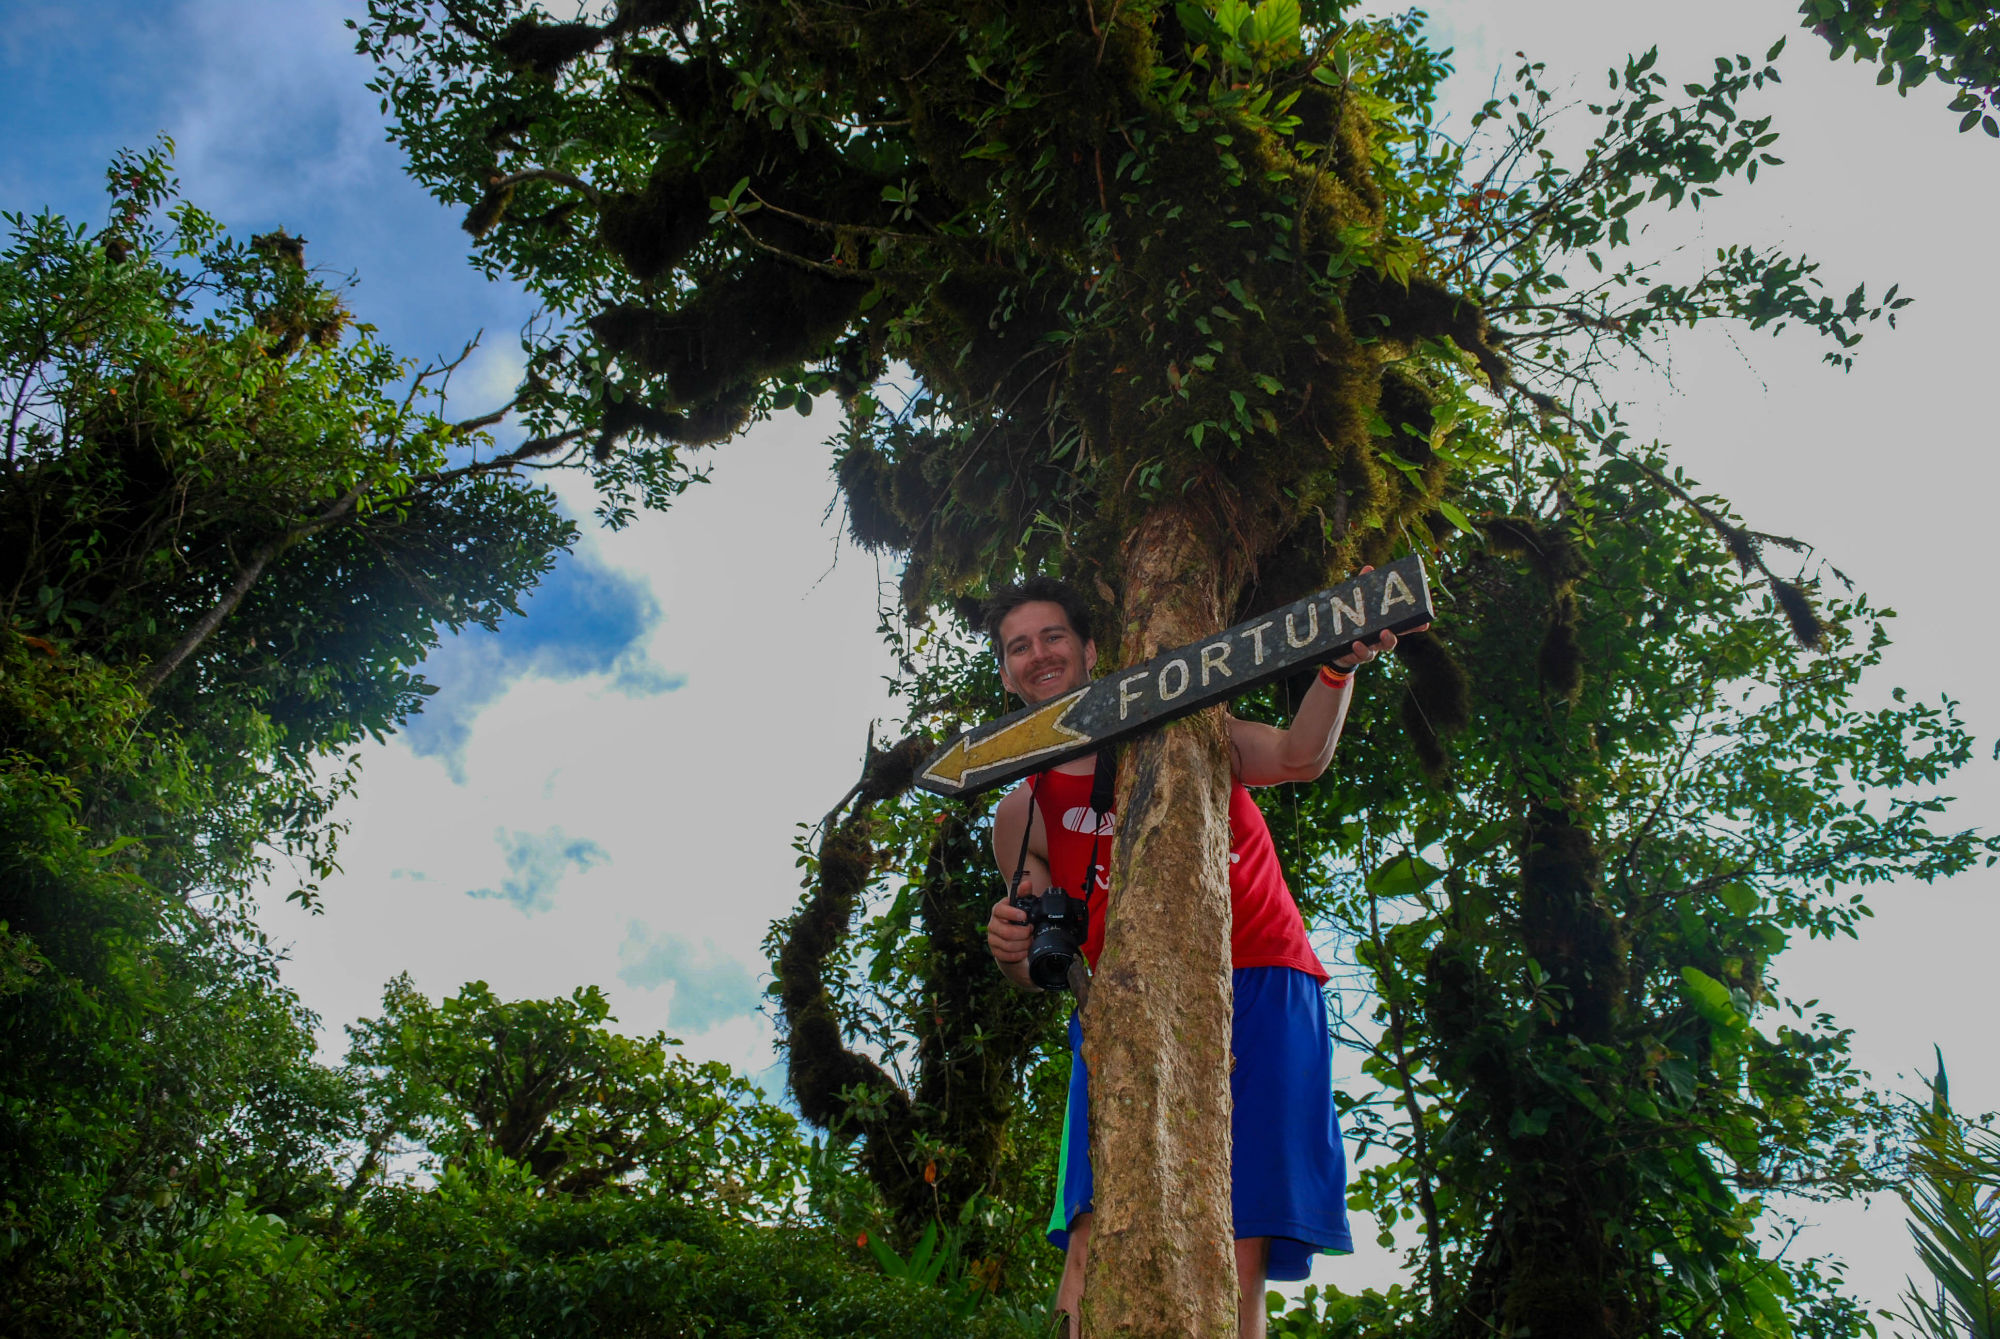 Joey with the La Fortuna Hiking Sign